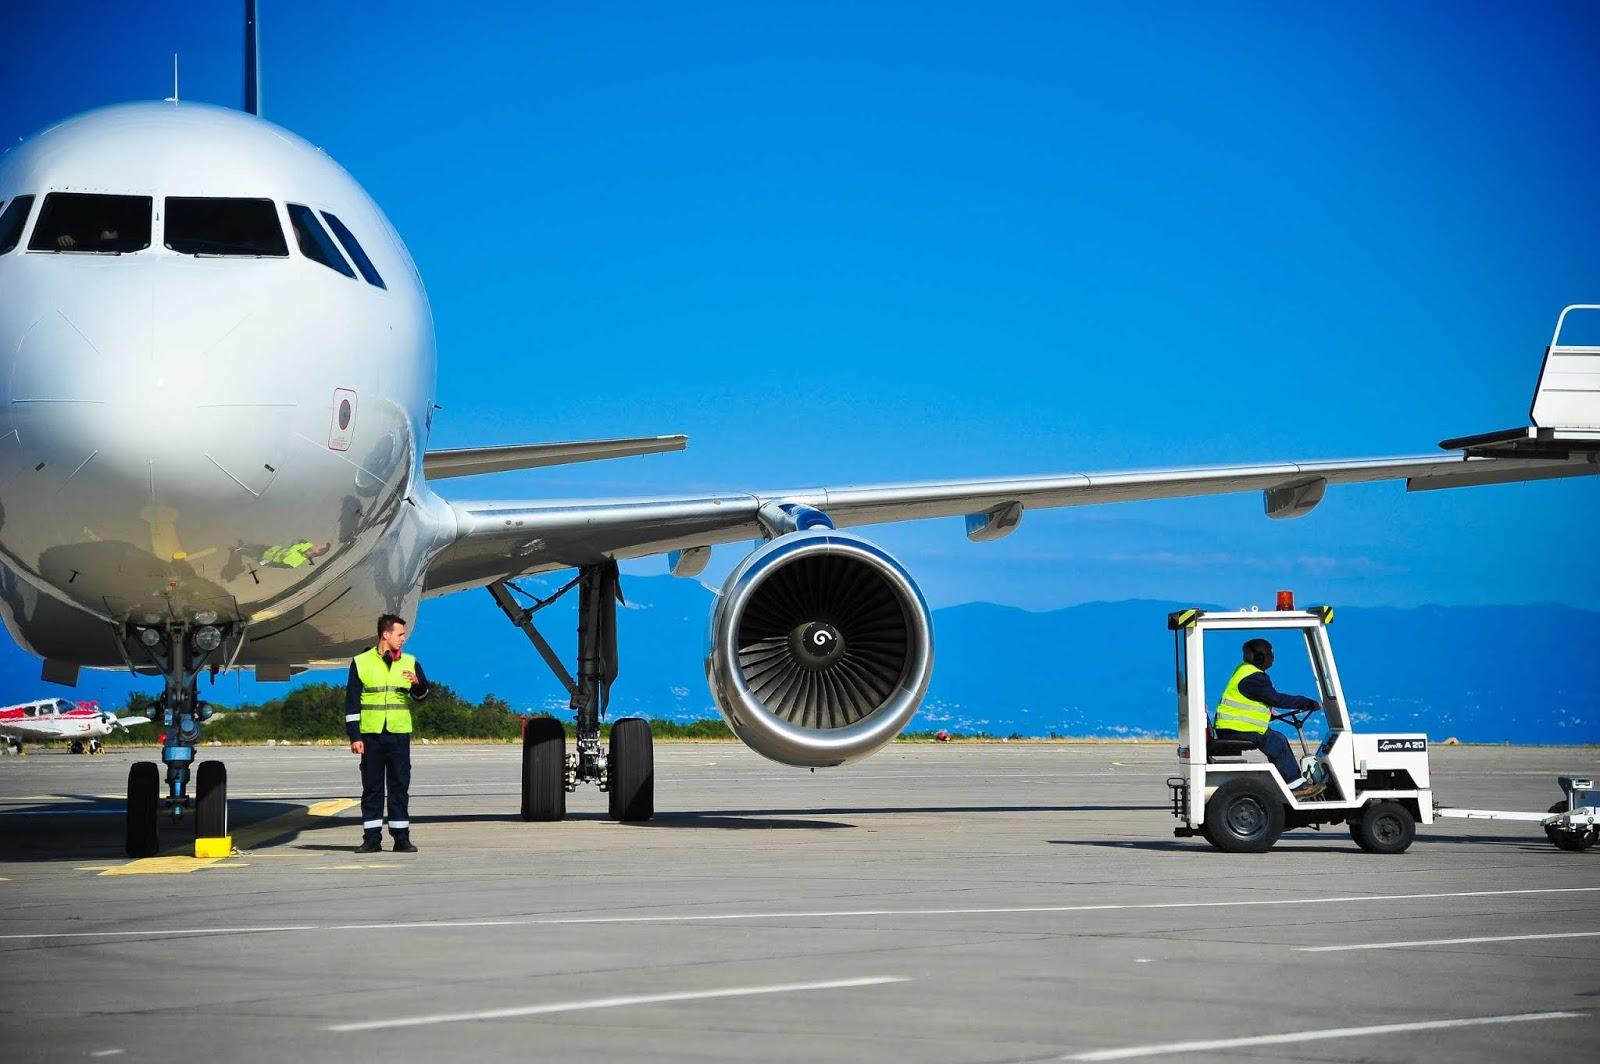 5 Bandara Dengan Ukuran Terkecil di Dunia